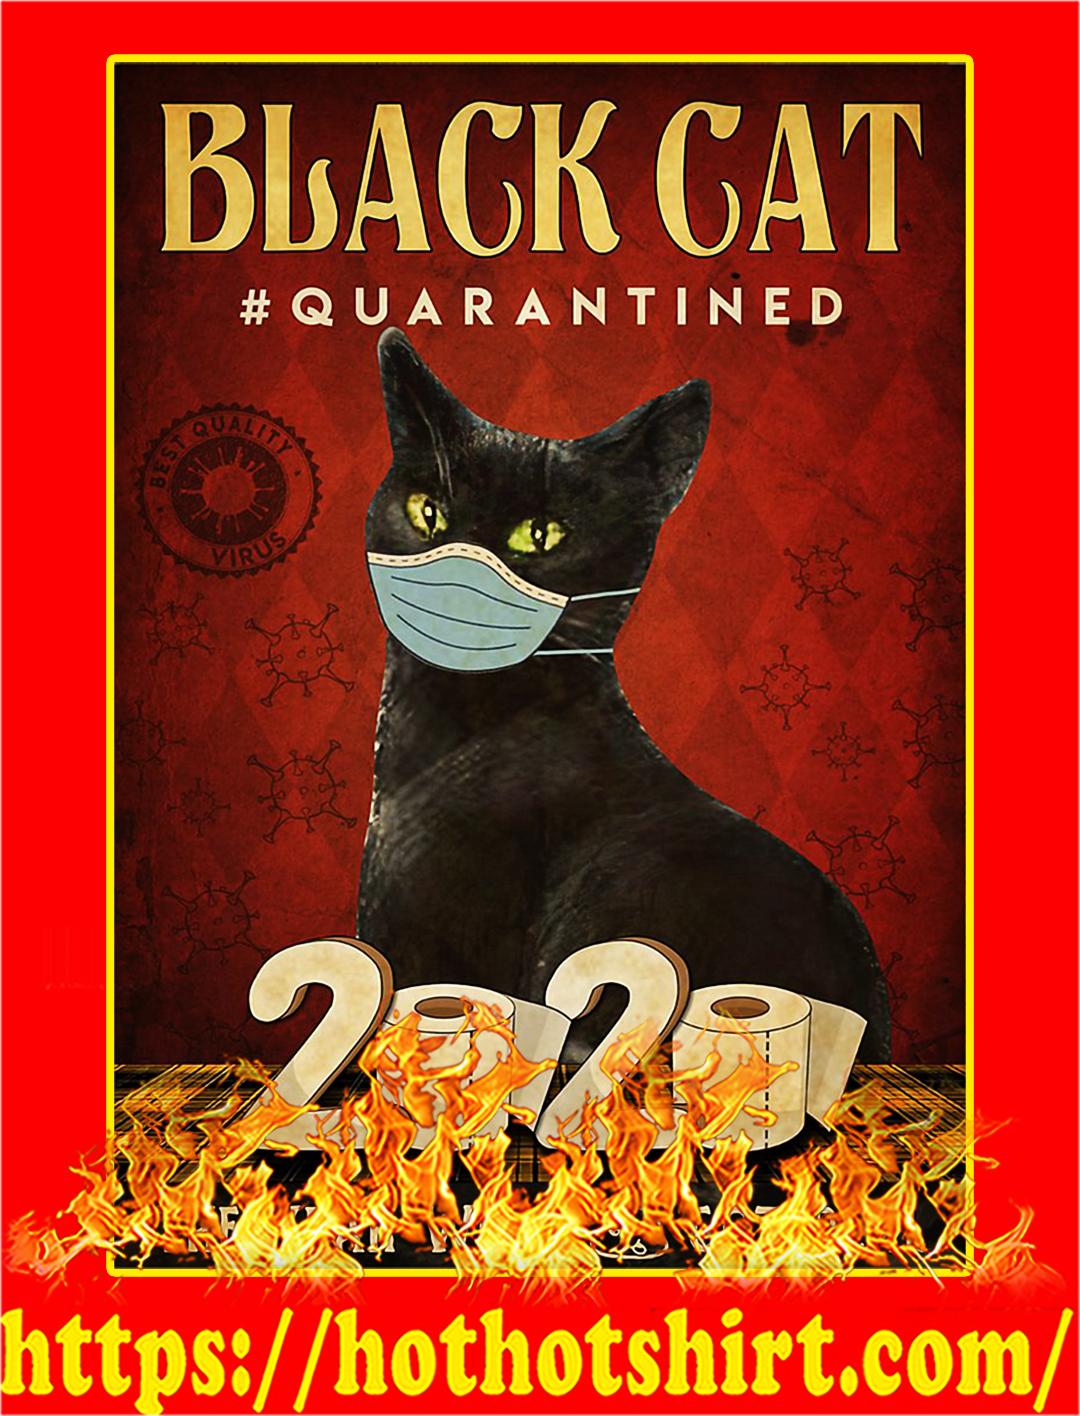 Black cat quarantined 2020 poster - A1